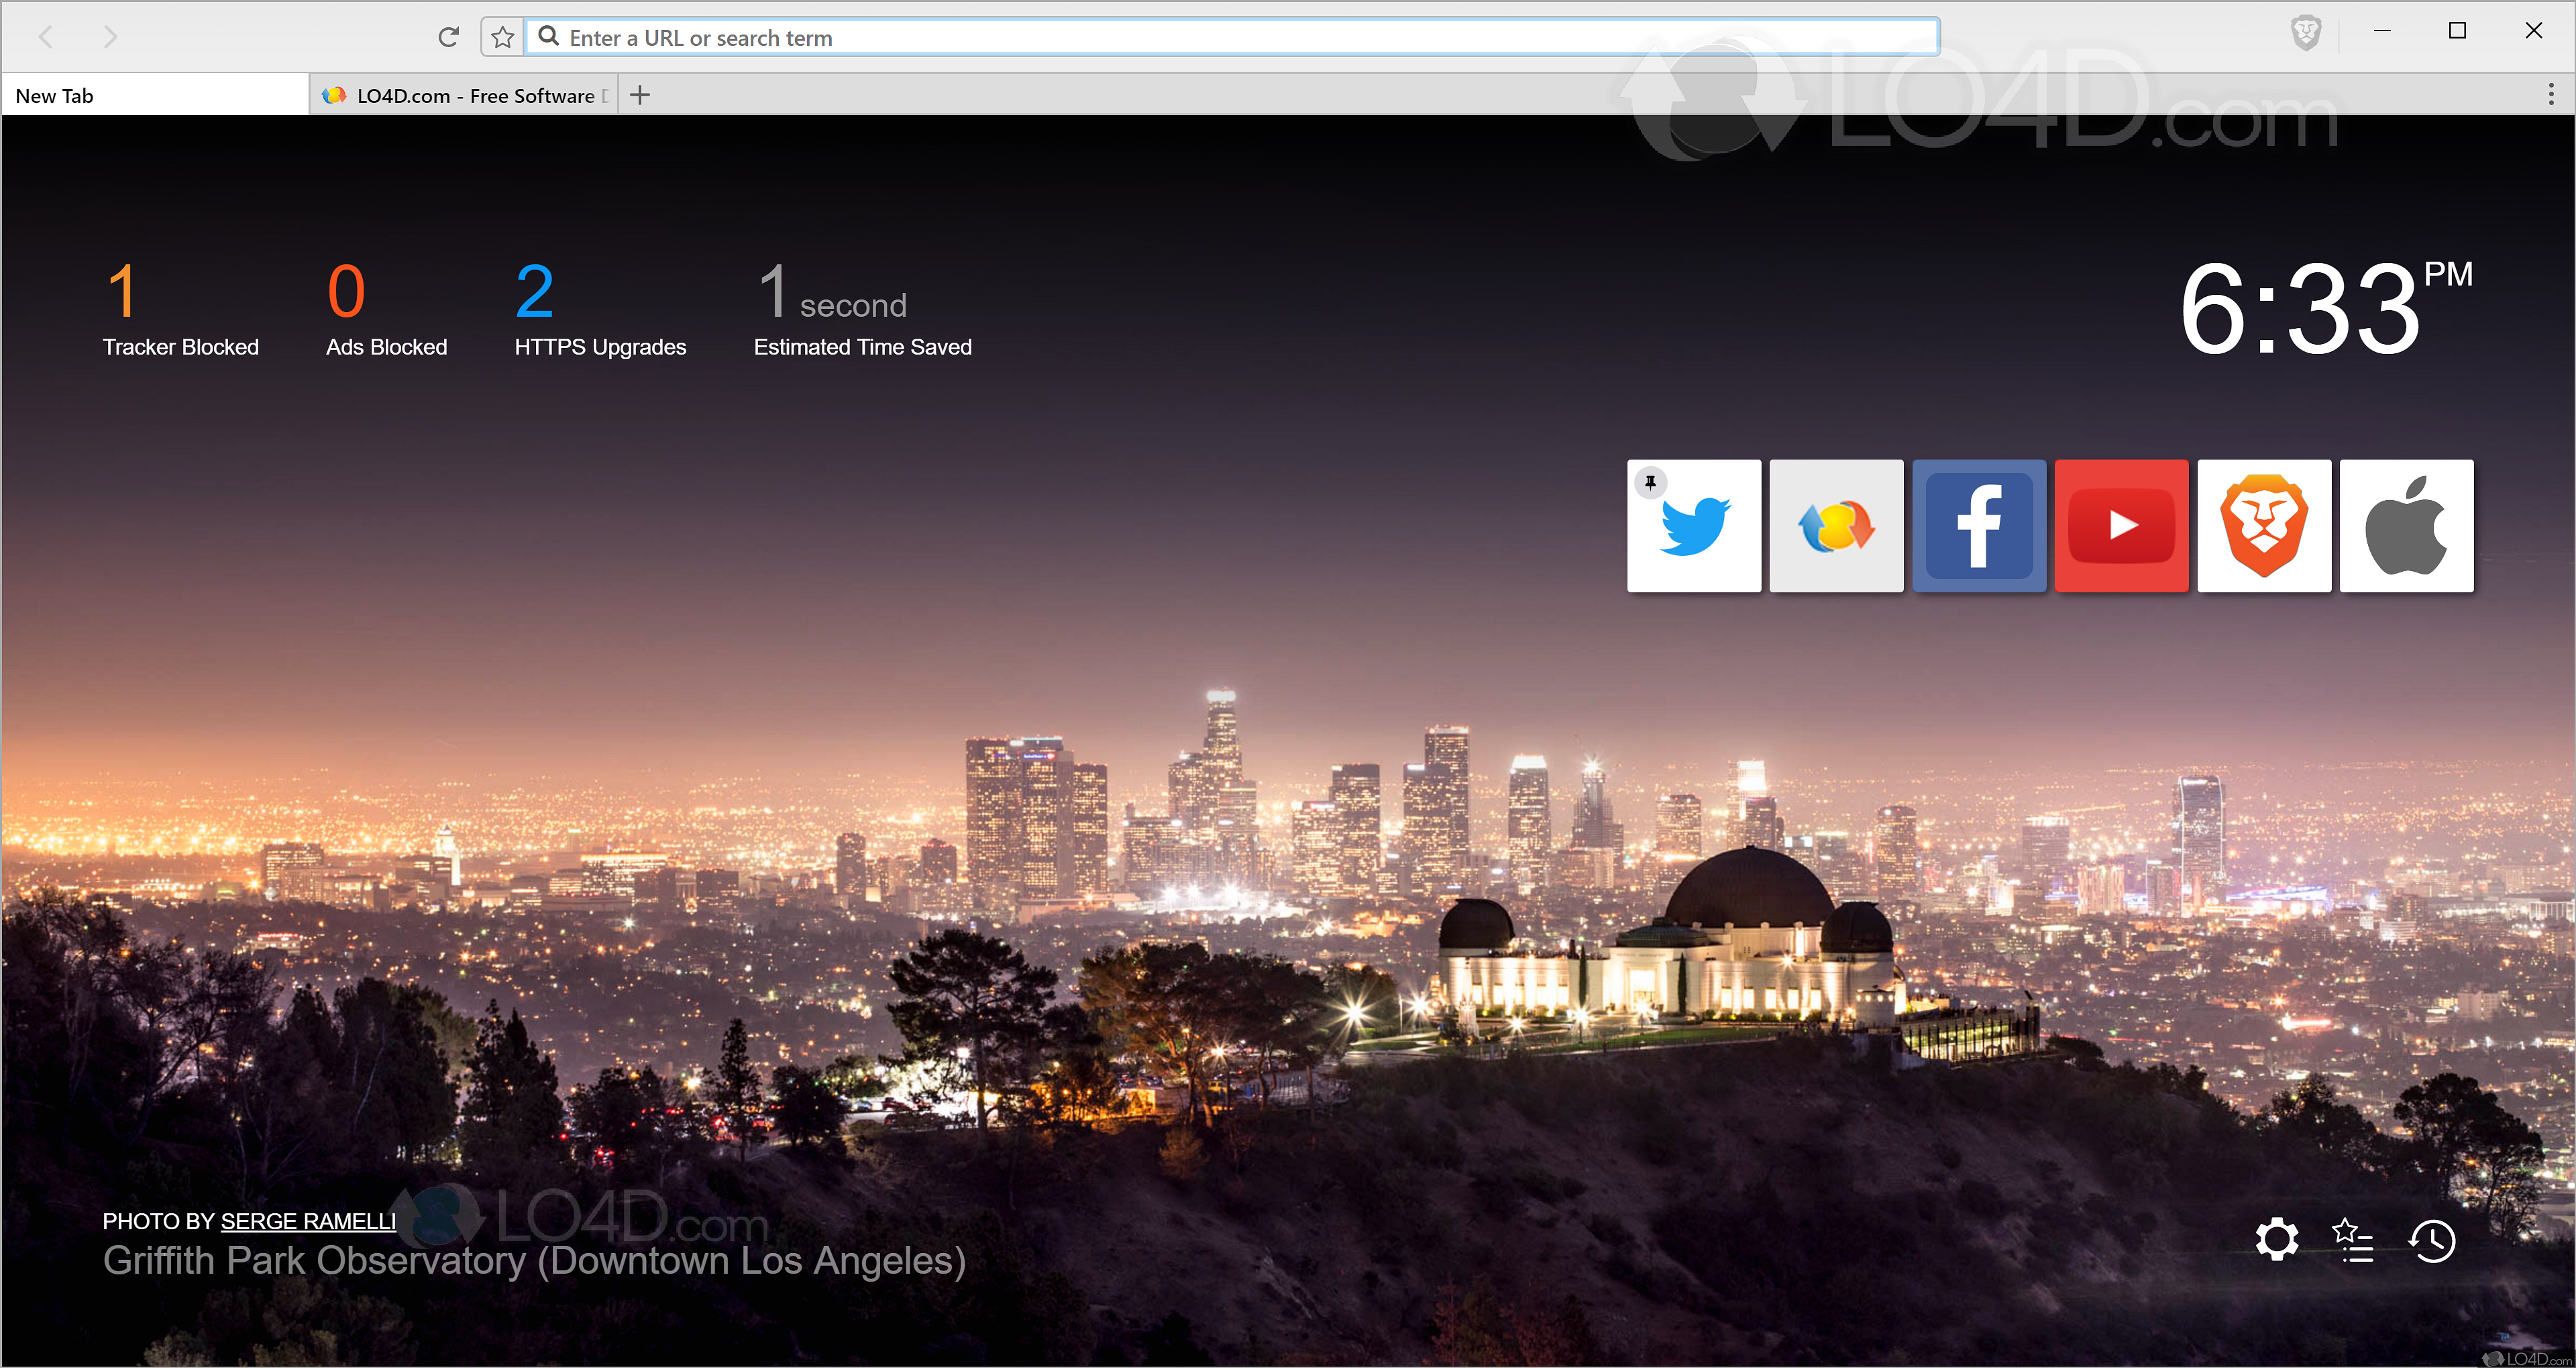 Brave Browser - Screenshots